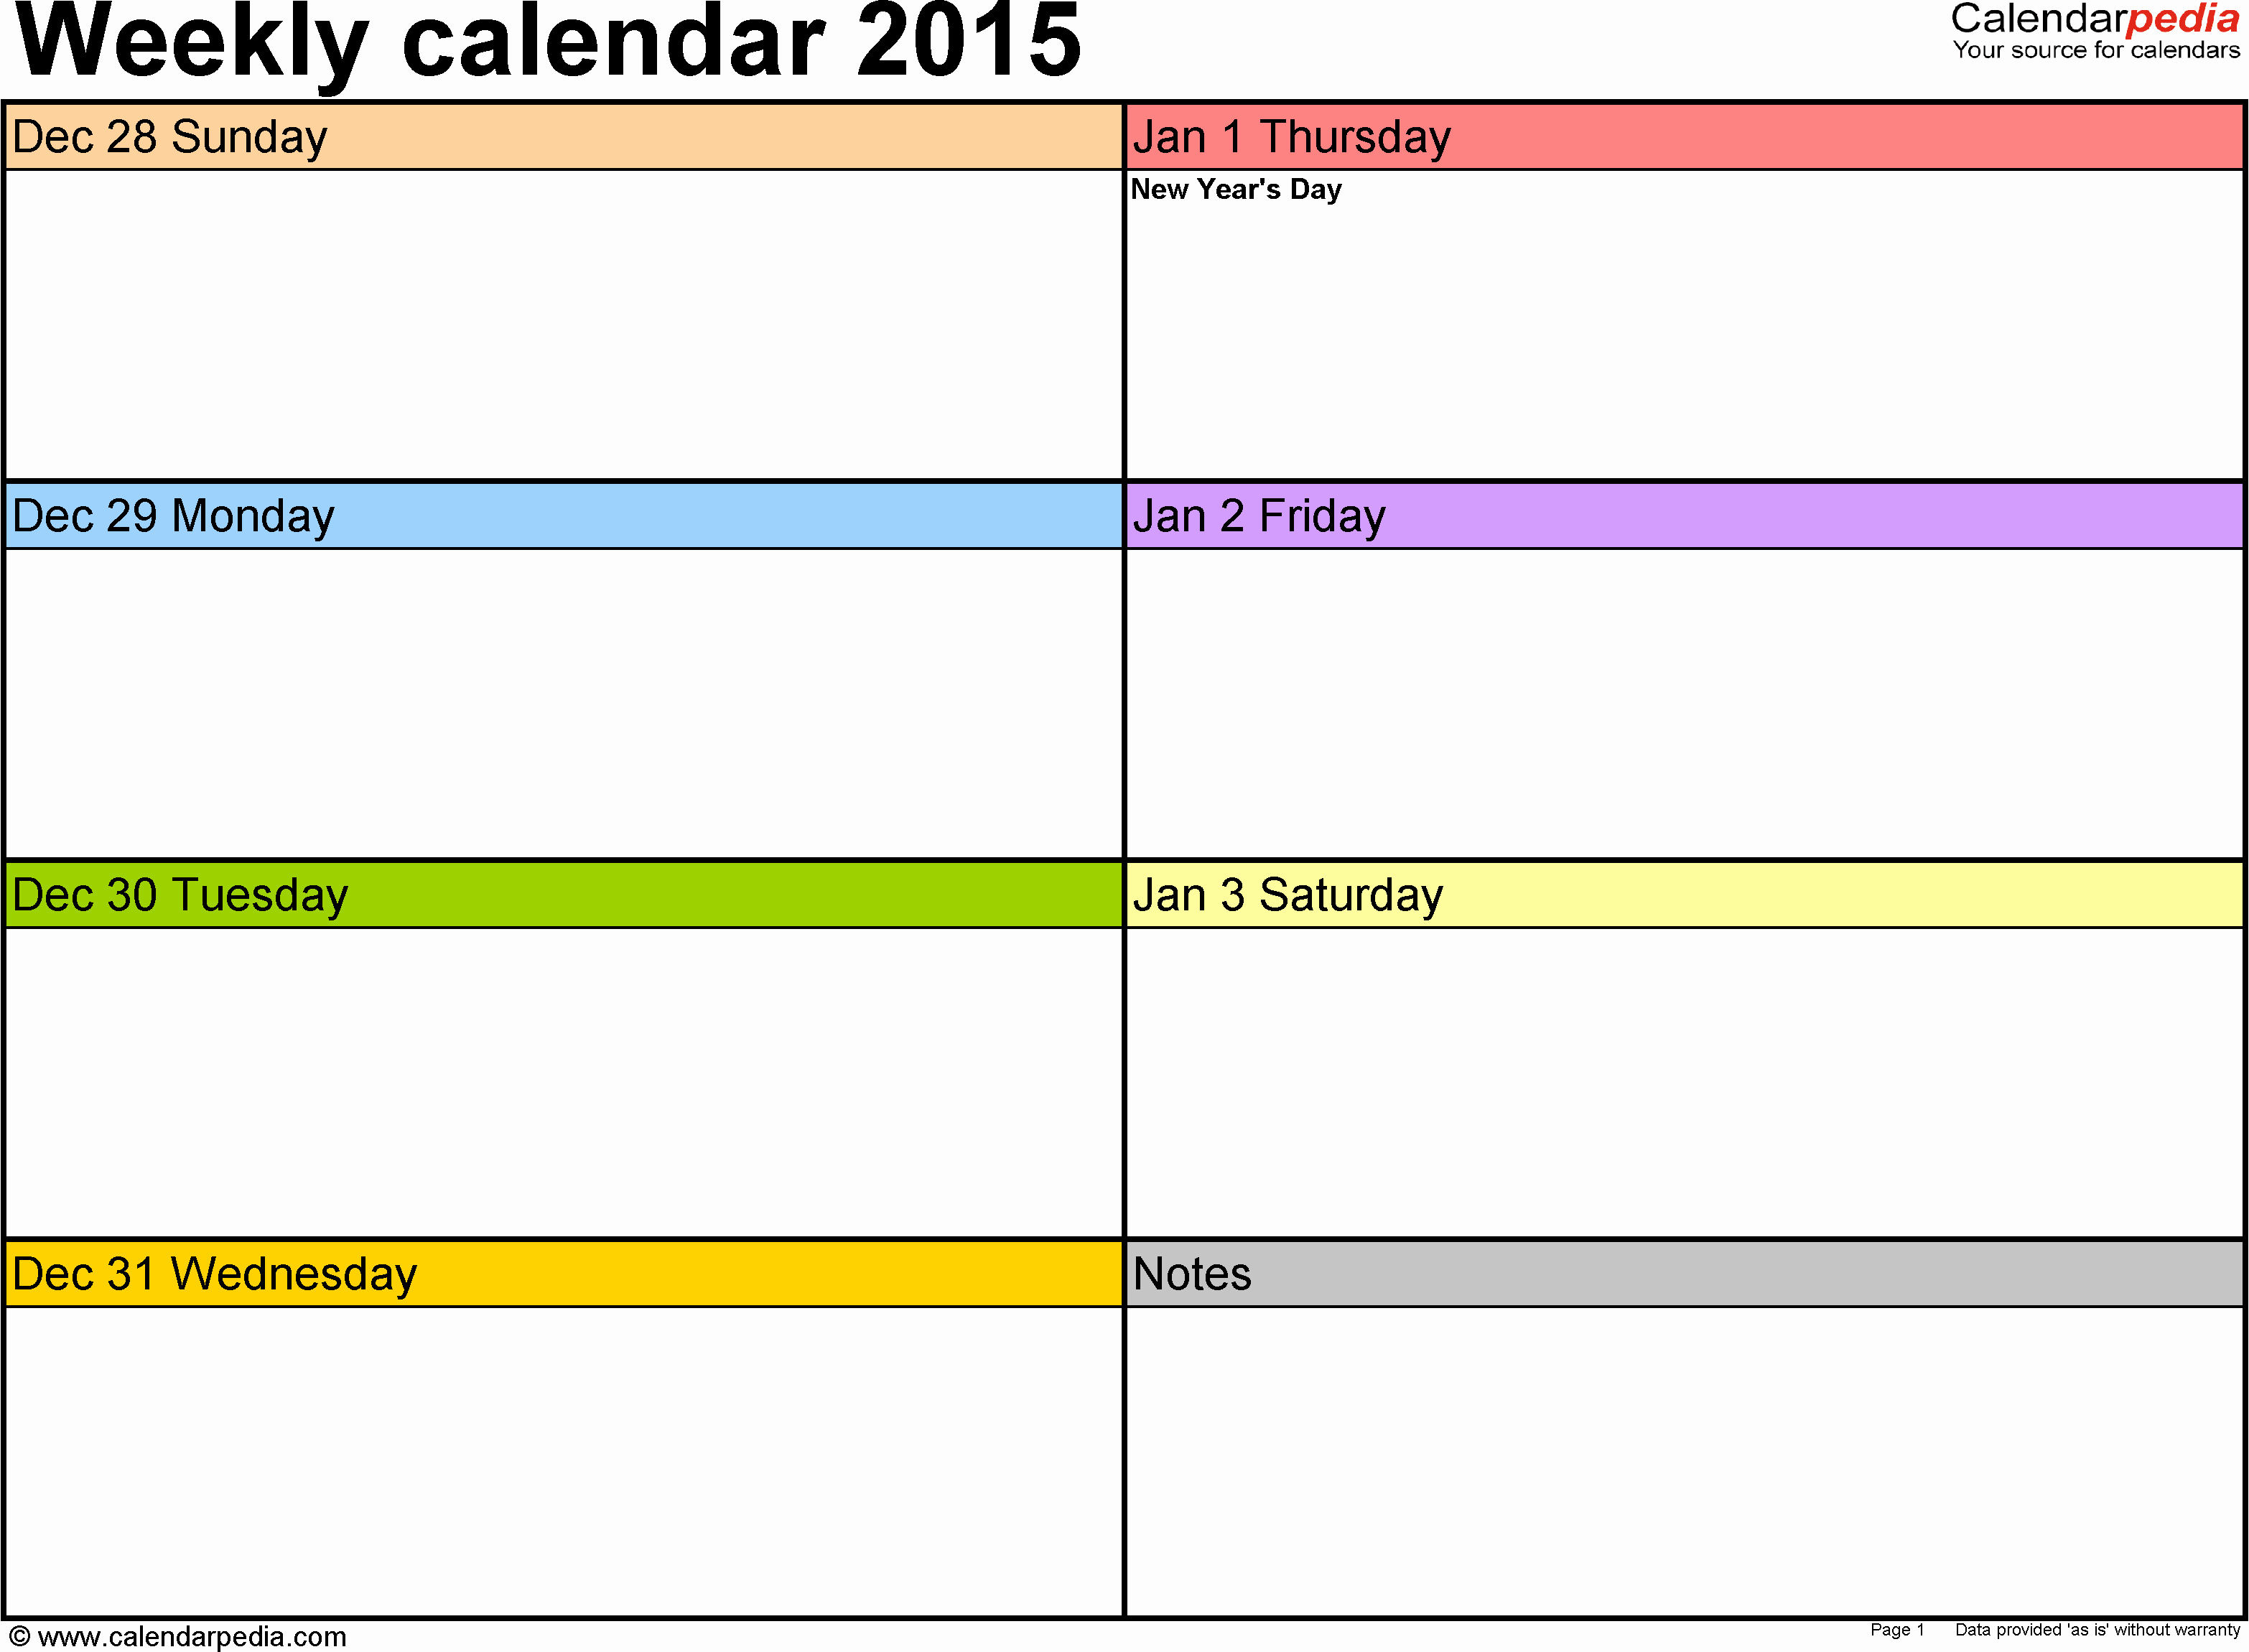 Weekly Calendar Template 2017 Awesome Weekly Calendar Template 2017